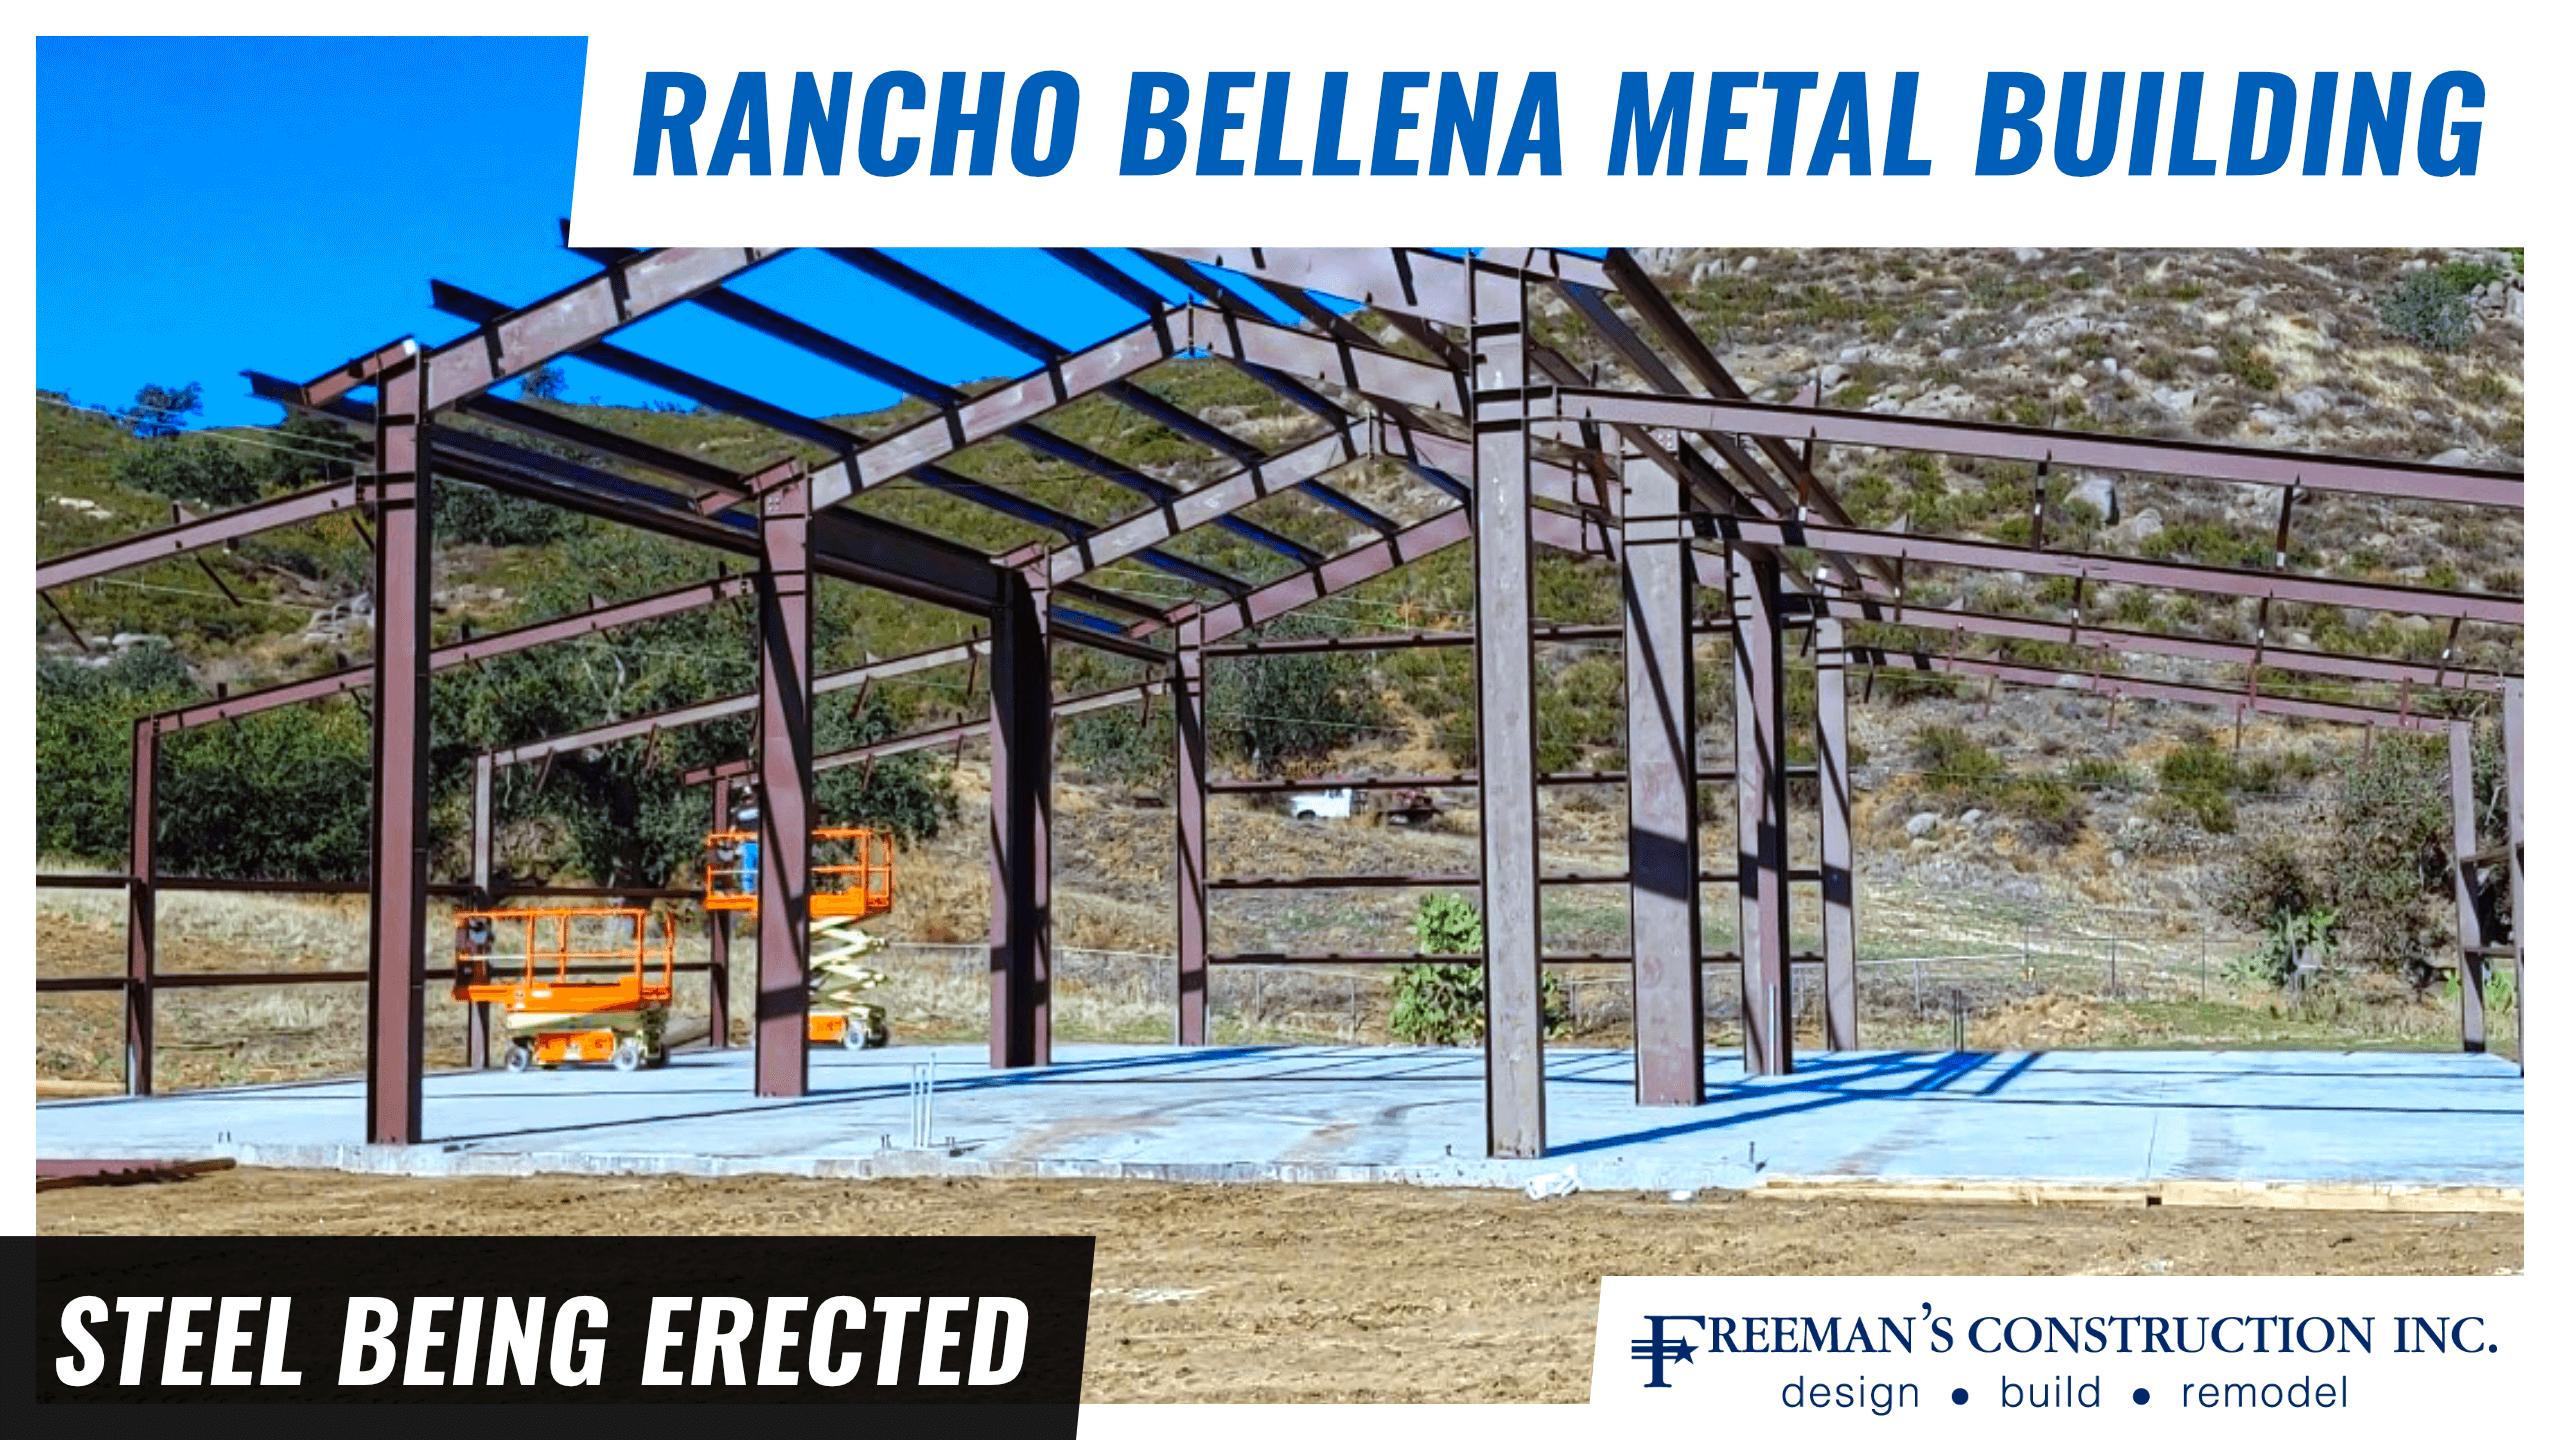 steel-frame-rancho-bellena-ramona-ca